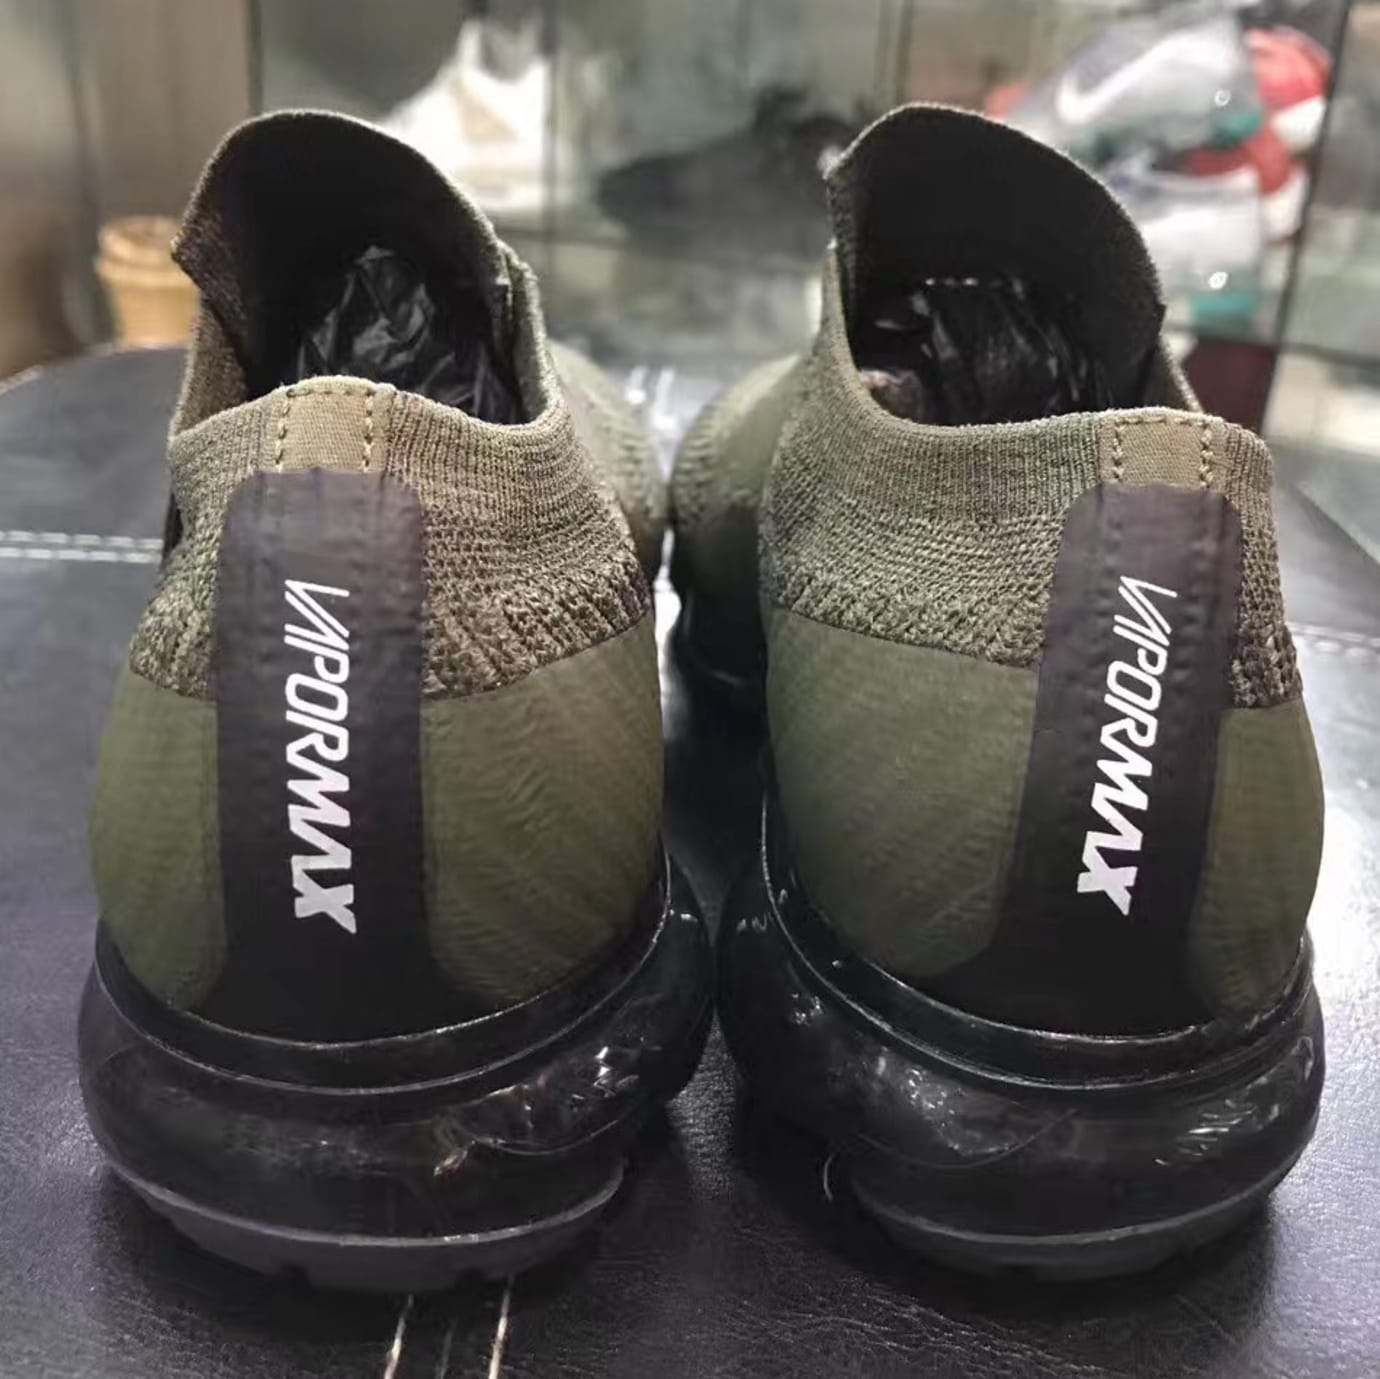 f25b23c3ca7 Image via Sneakerfiles Nike VaporMax Laceless Olive Black (Heel)